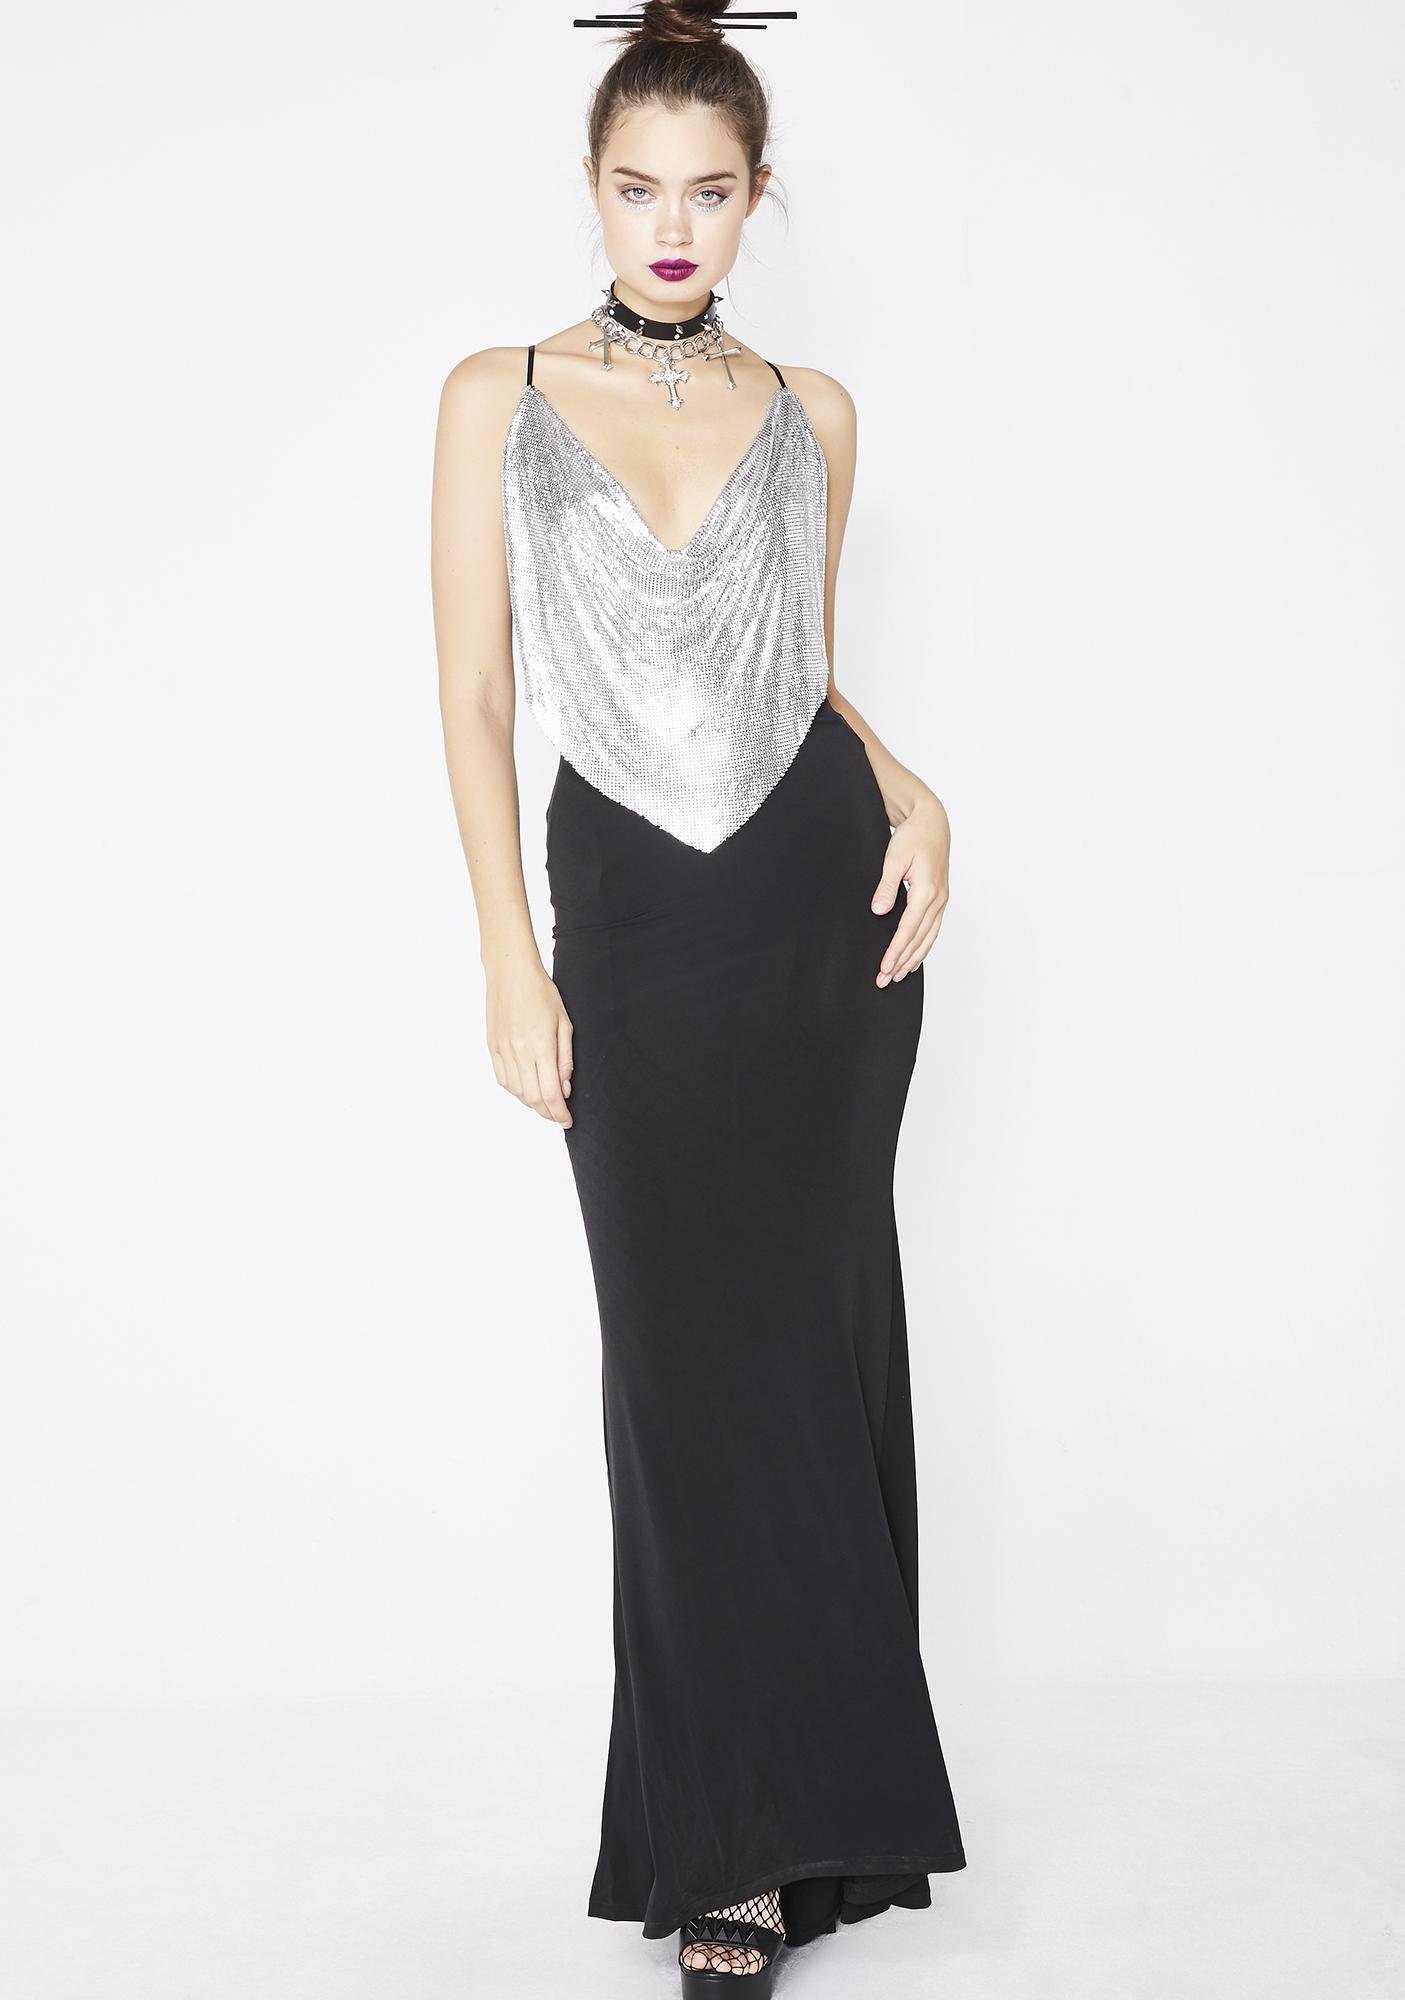 044f74f8190 Kiki Riki Dipped In Finesse Chainmail Dress